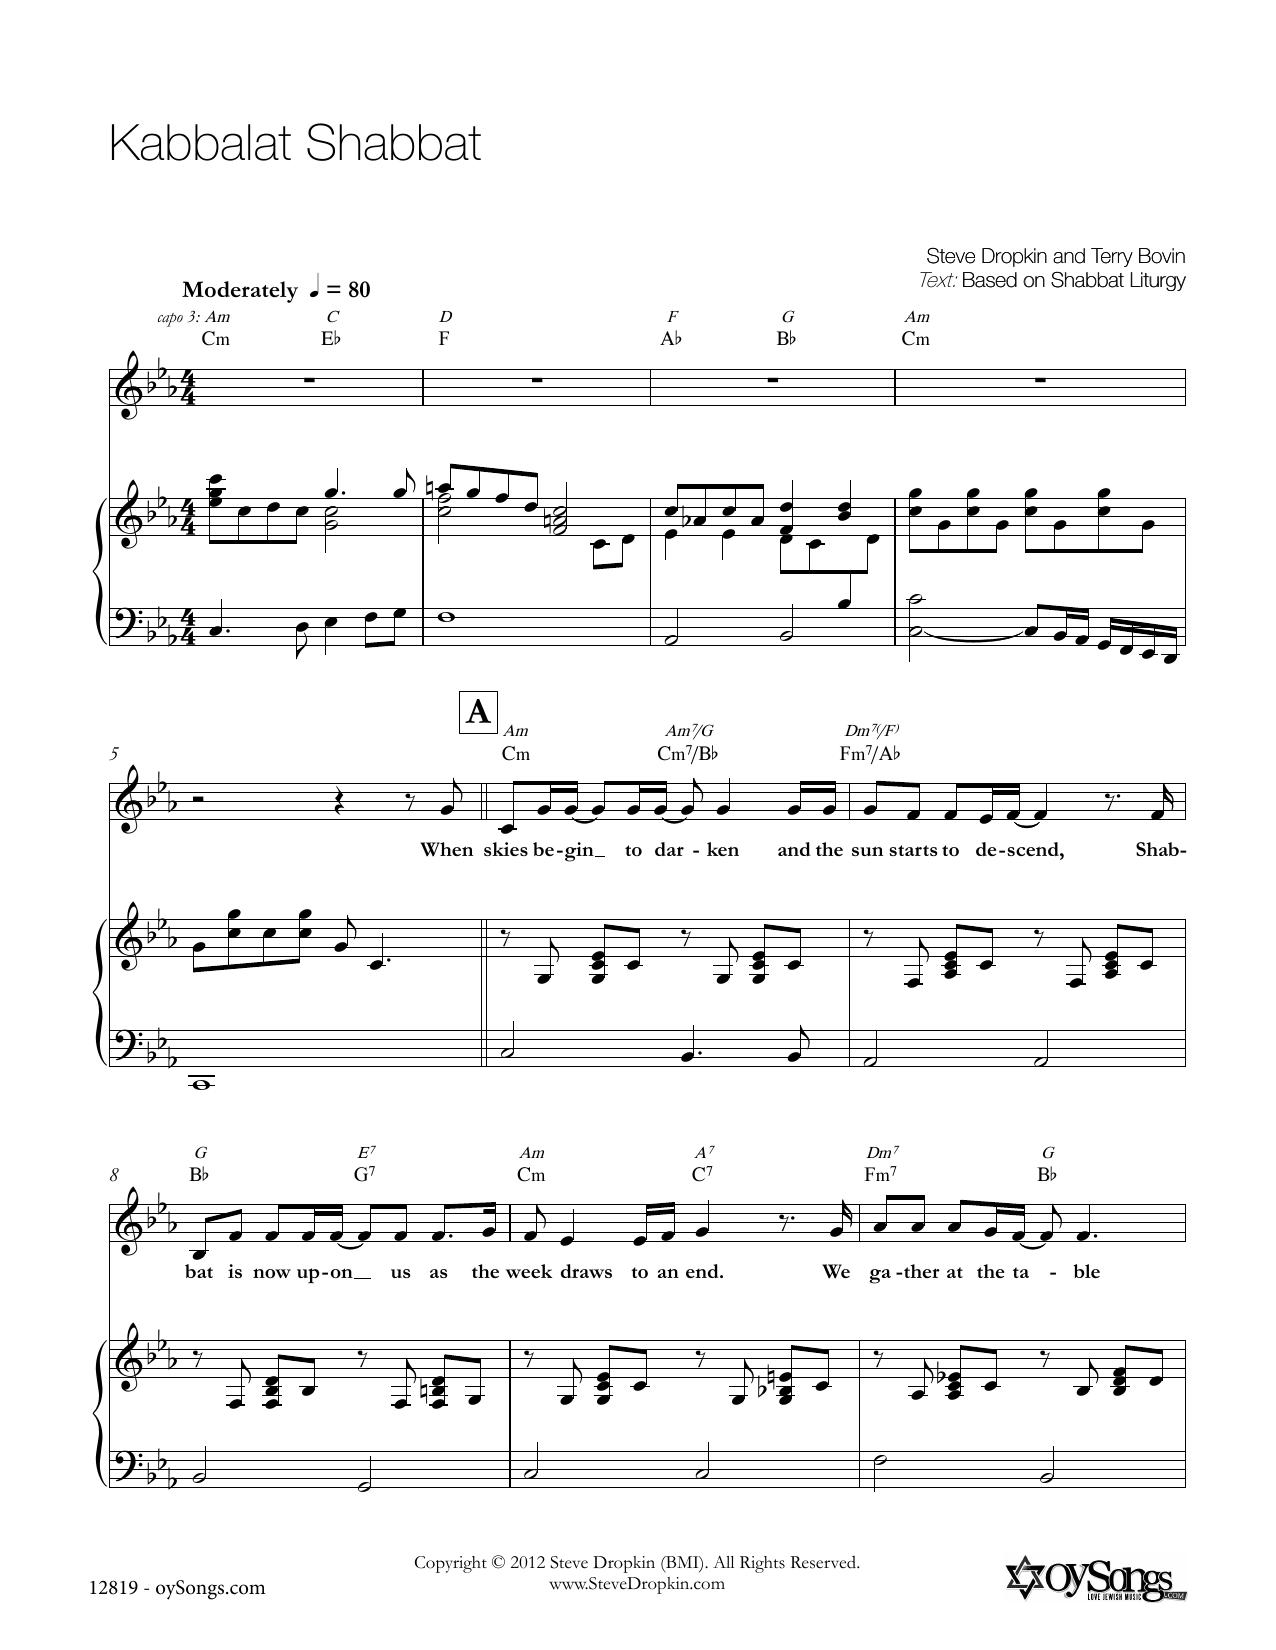 Kabbalat Shabbat Sheet Music